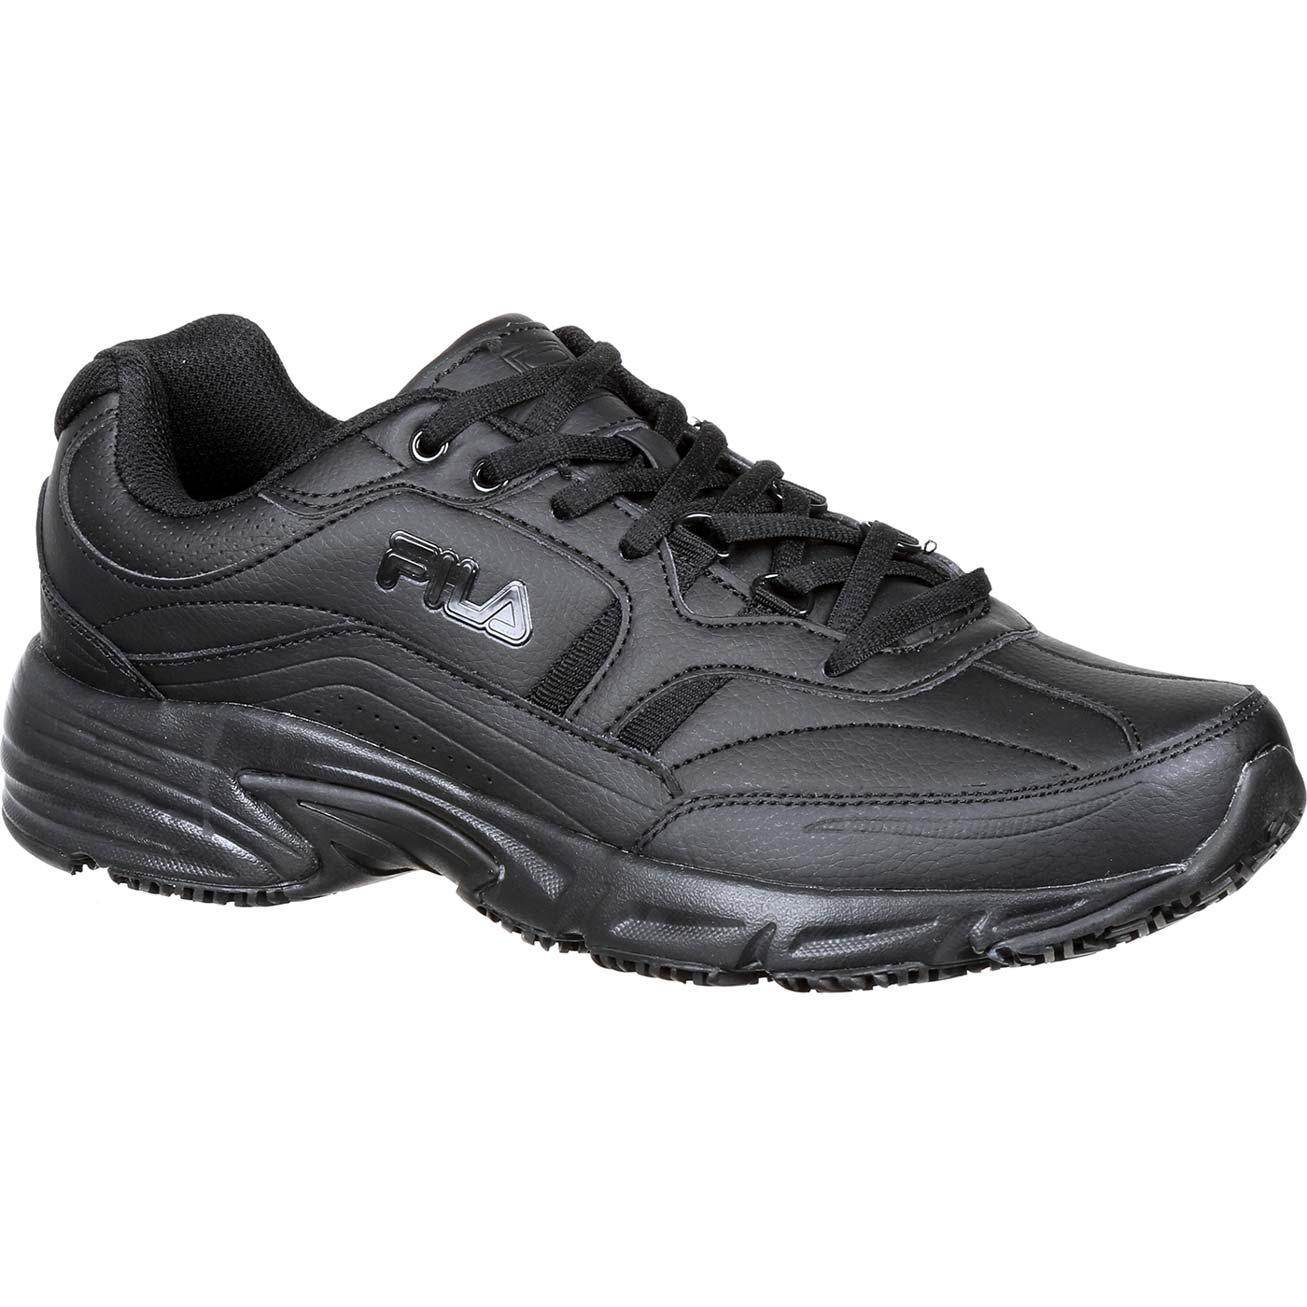 d1027a0ad1 Fila Memory Workshift Women's Slip-Resistant Work Athletic Shoe